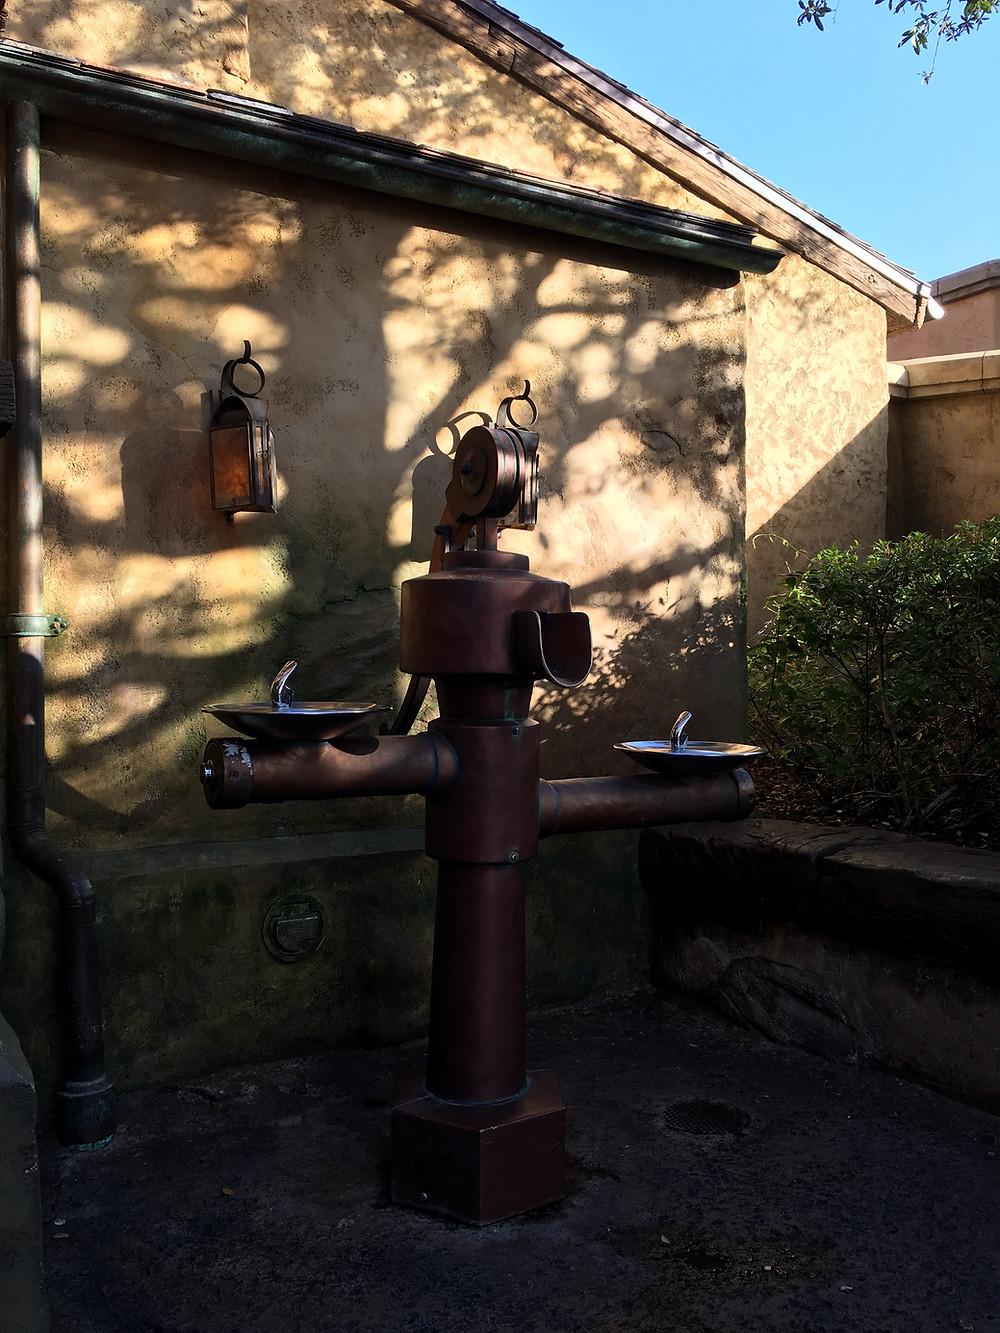 Water fountain/water pump outside Gaston's Tavern Loo, Magic Kingdom